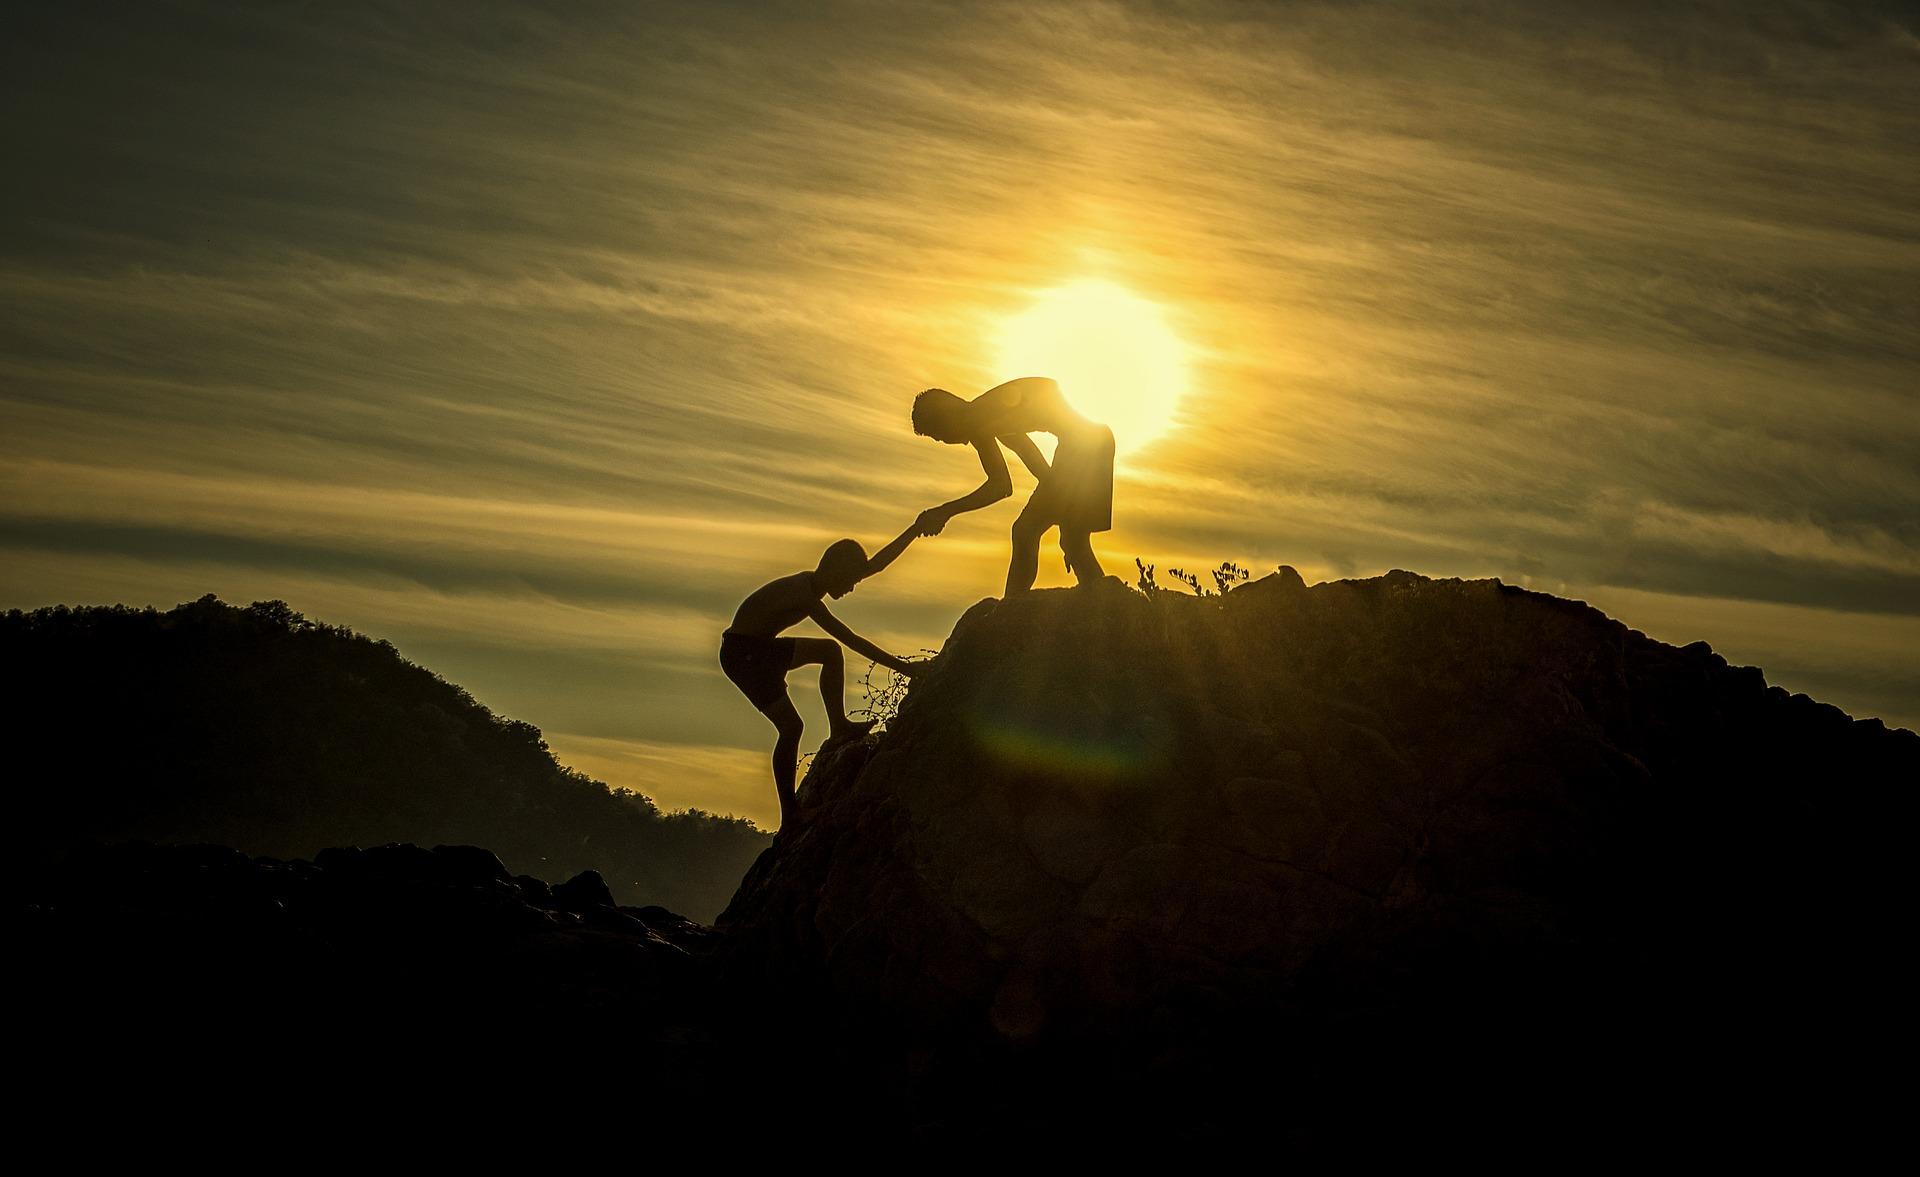 desafio foto pixabay